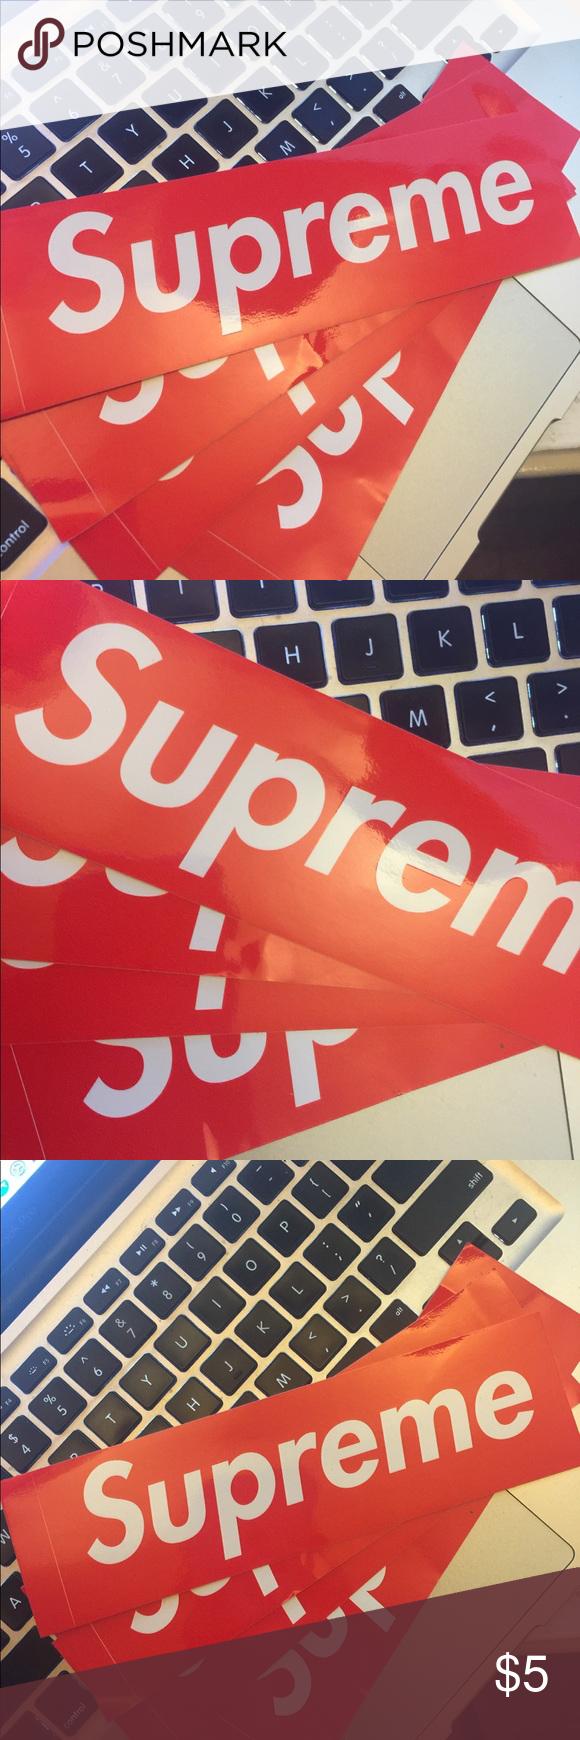 Supreme Stickers My Posh Picks Pinterest Sticker Original From Other